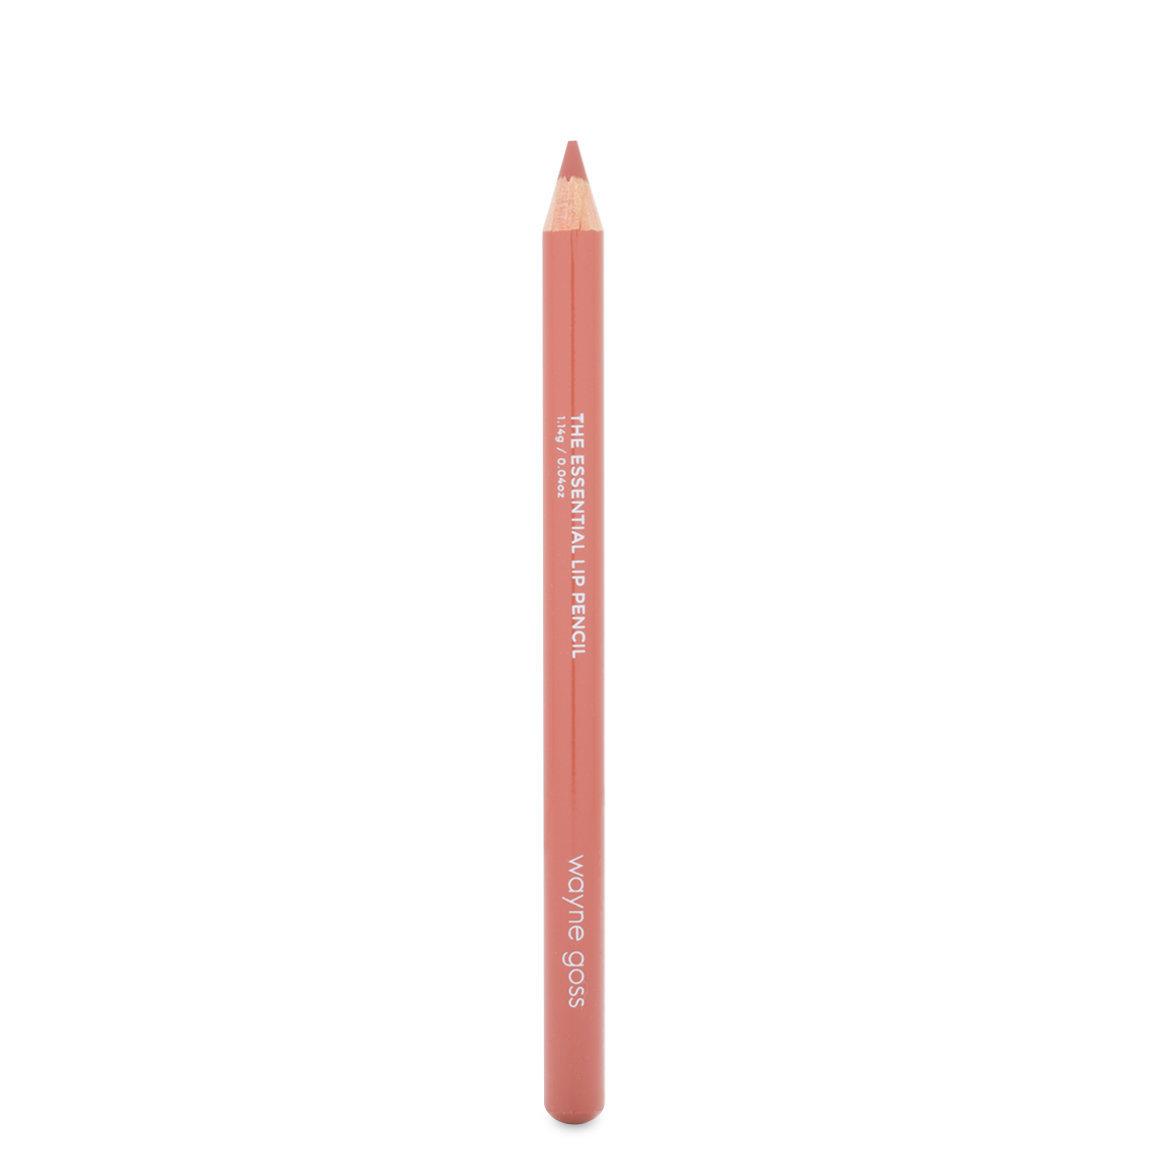 Wayne Goss The Essential Lip Pencil Mauve alternative view 1.